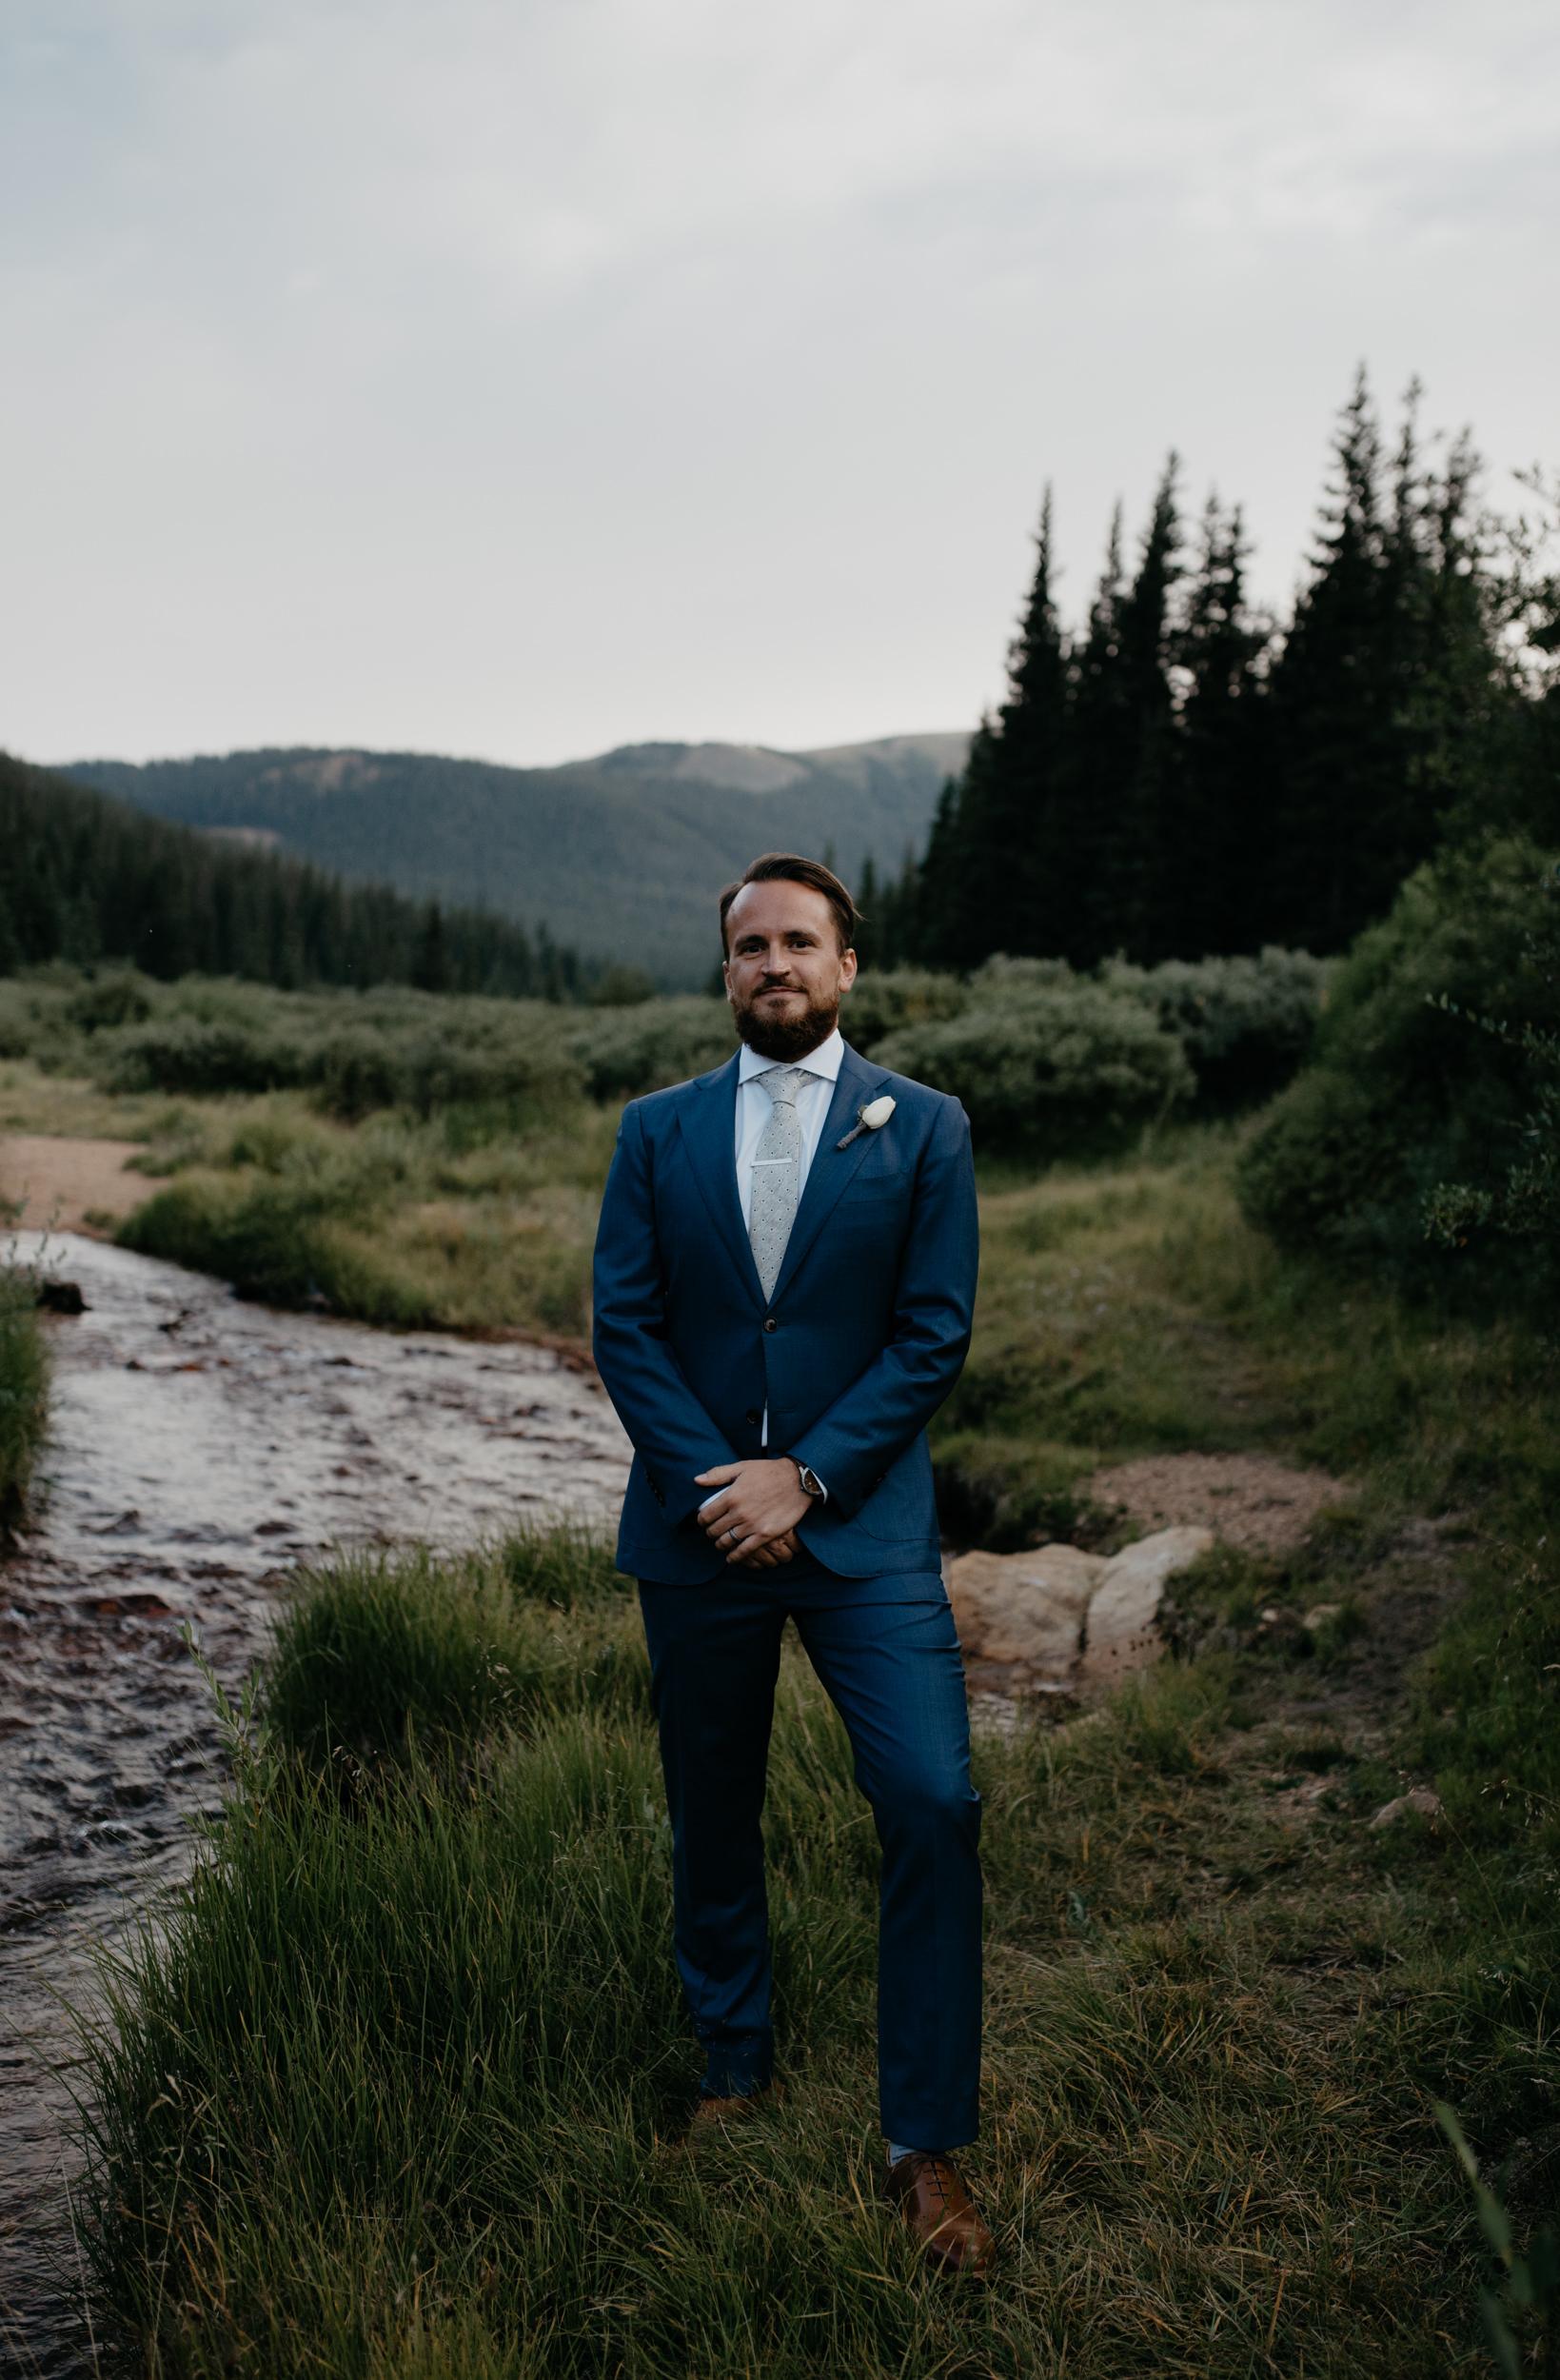 Portrait of groom by Colorado elopement photographer, Alyssa Reinhold.